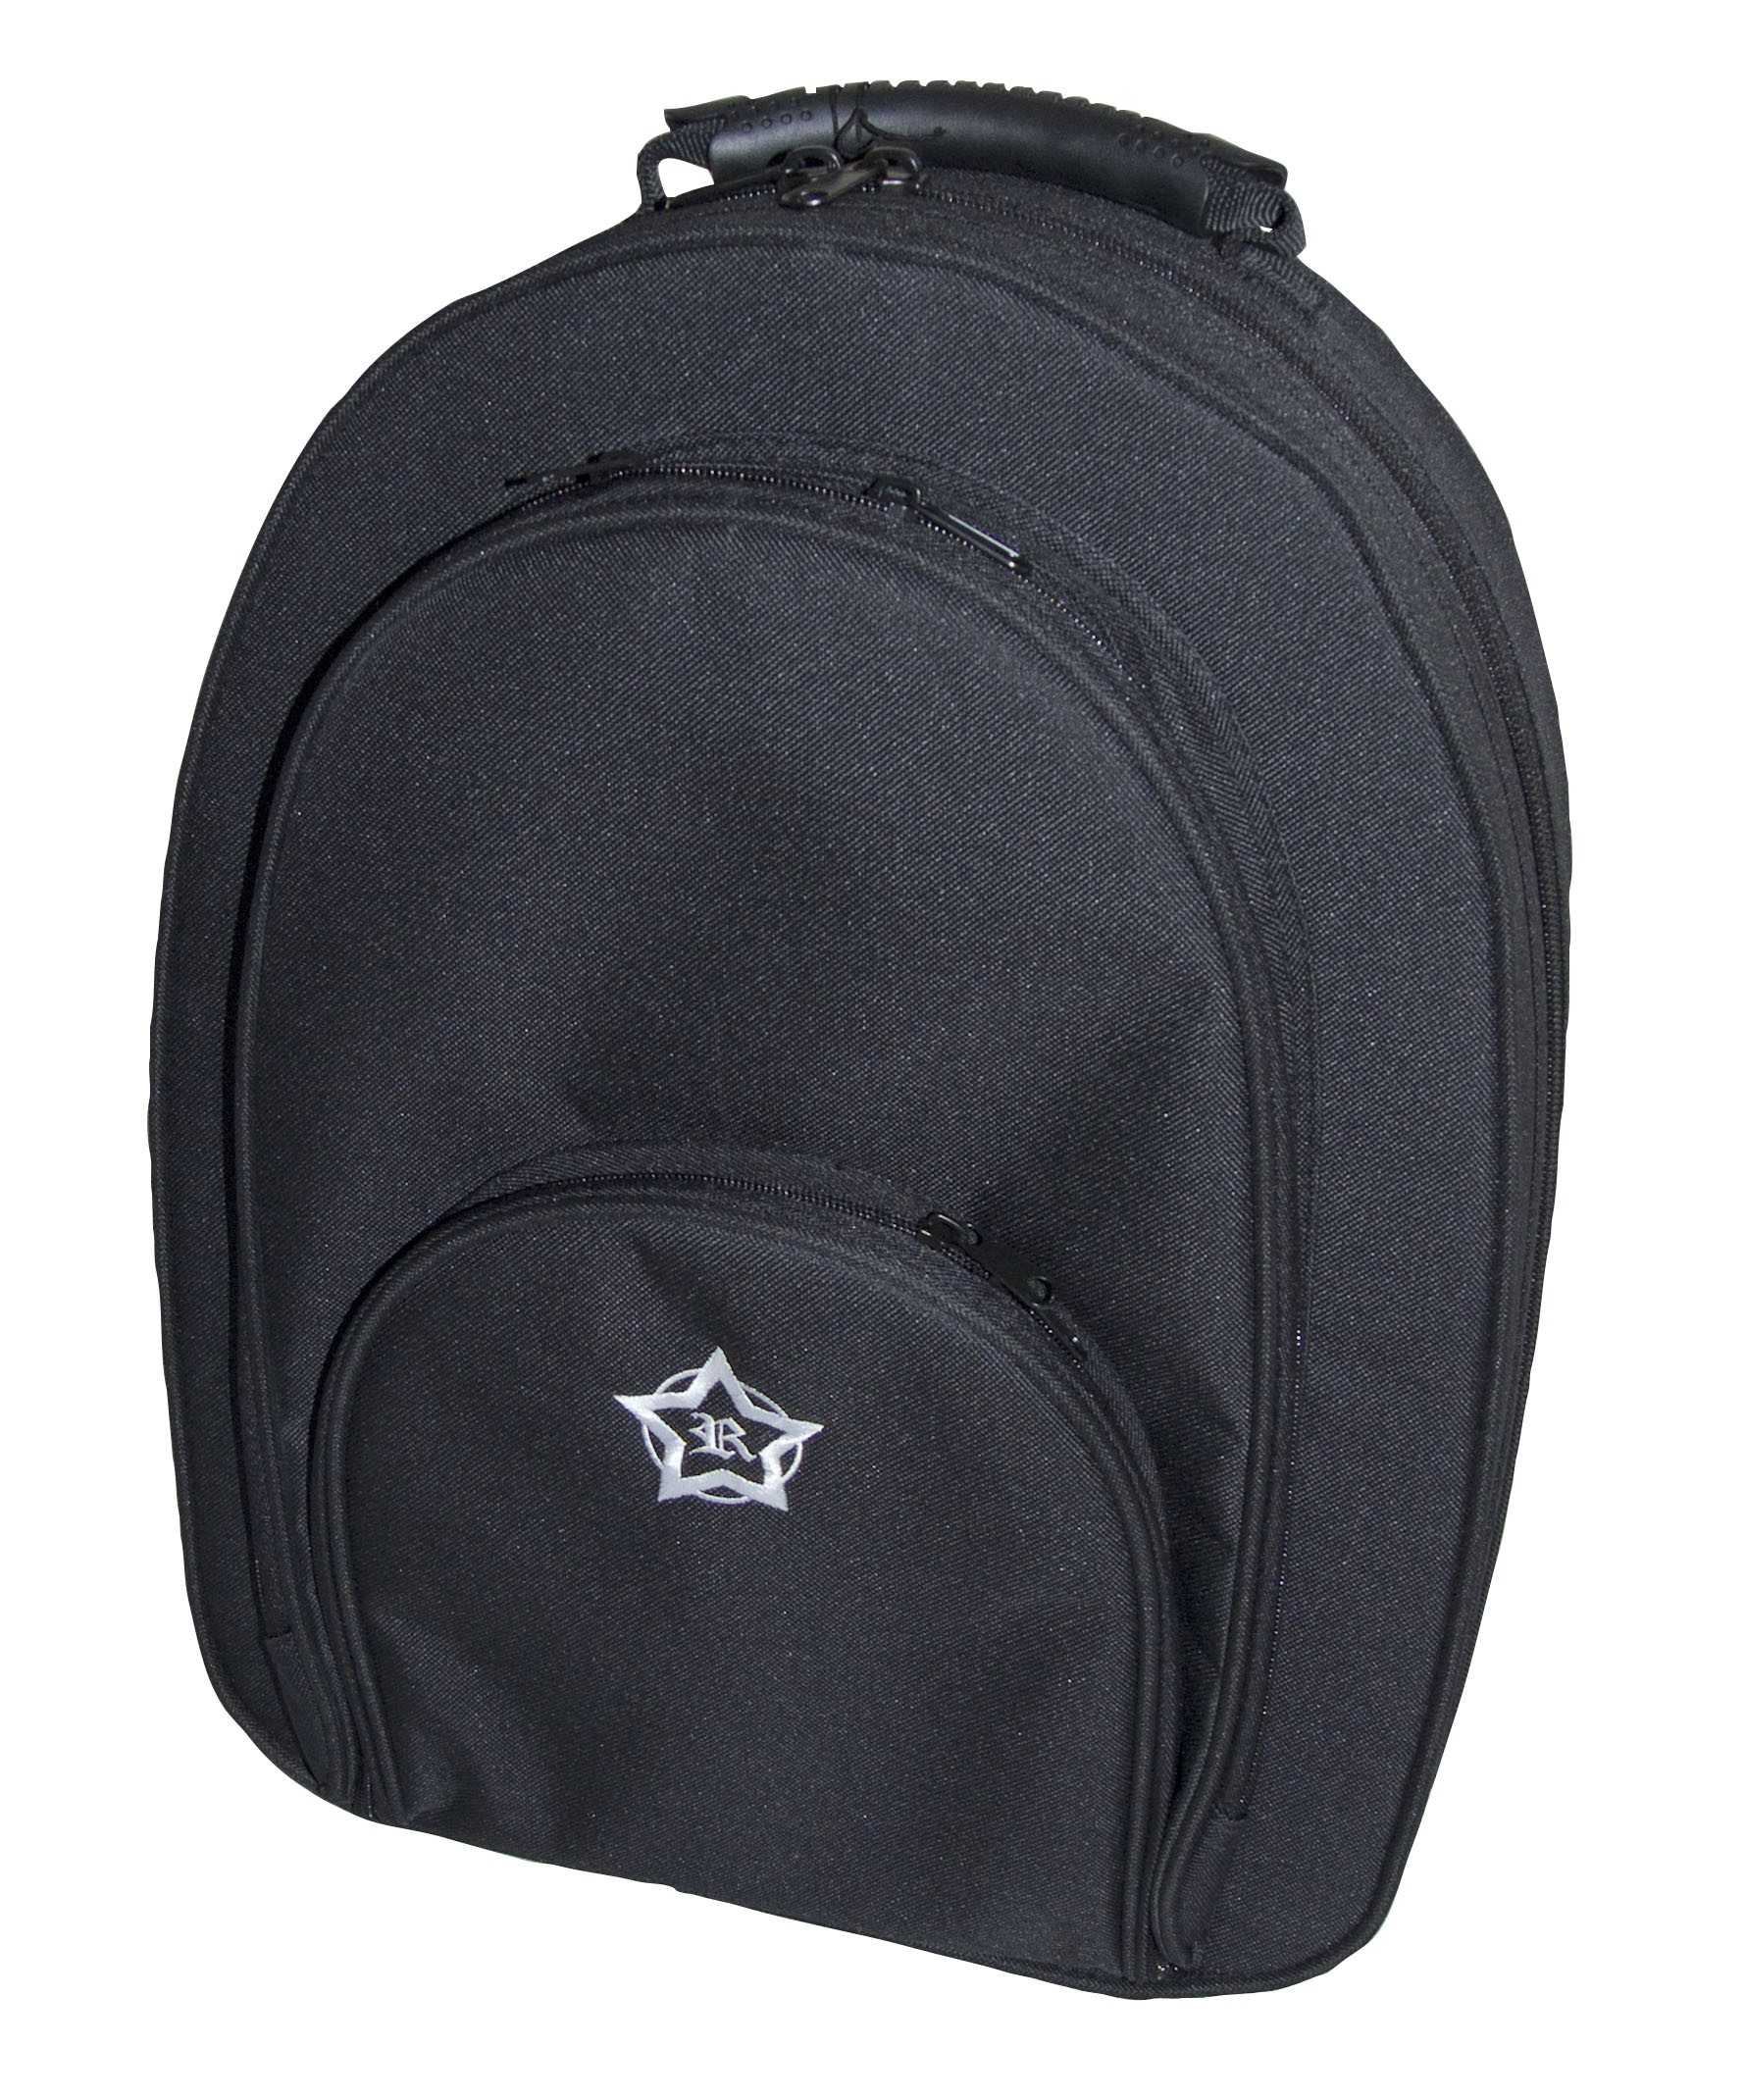 Rosetti Clarinet Bag - Black